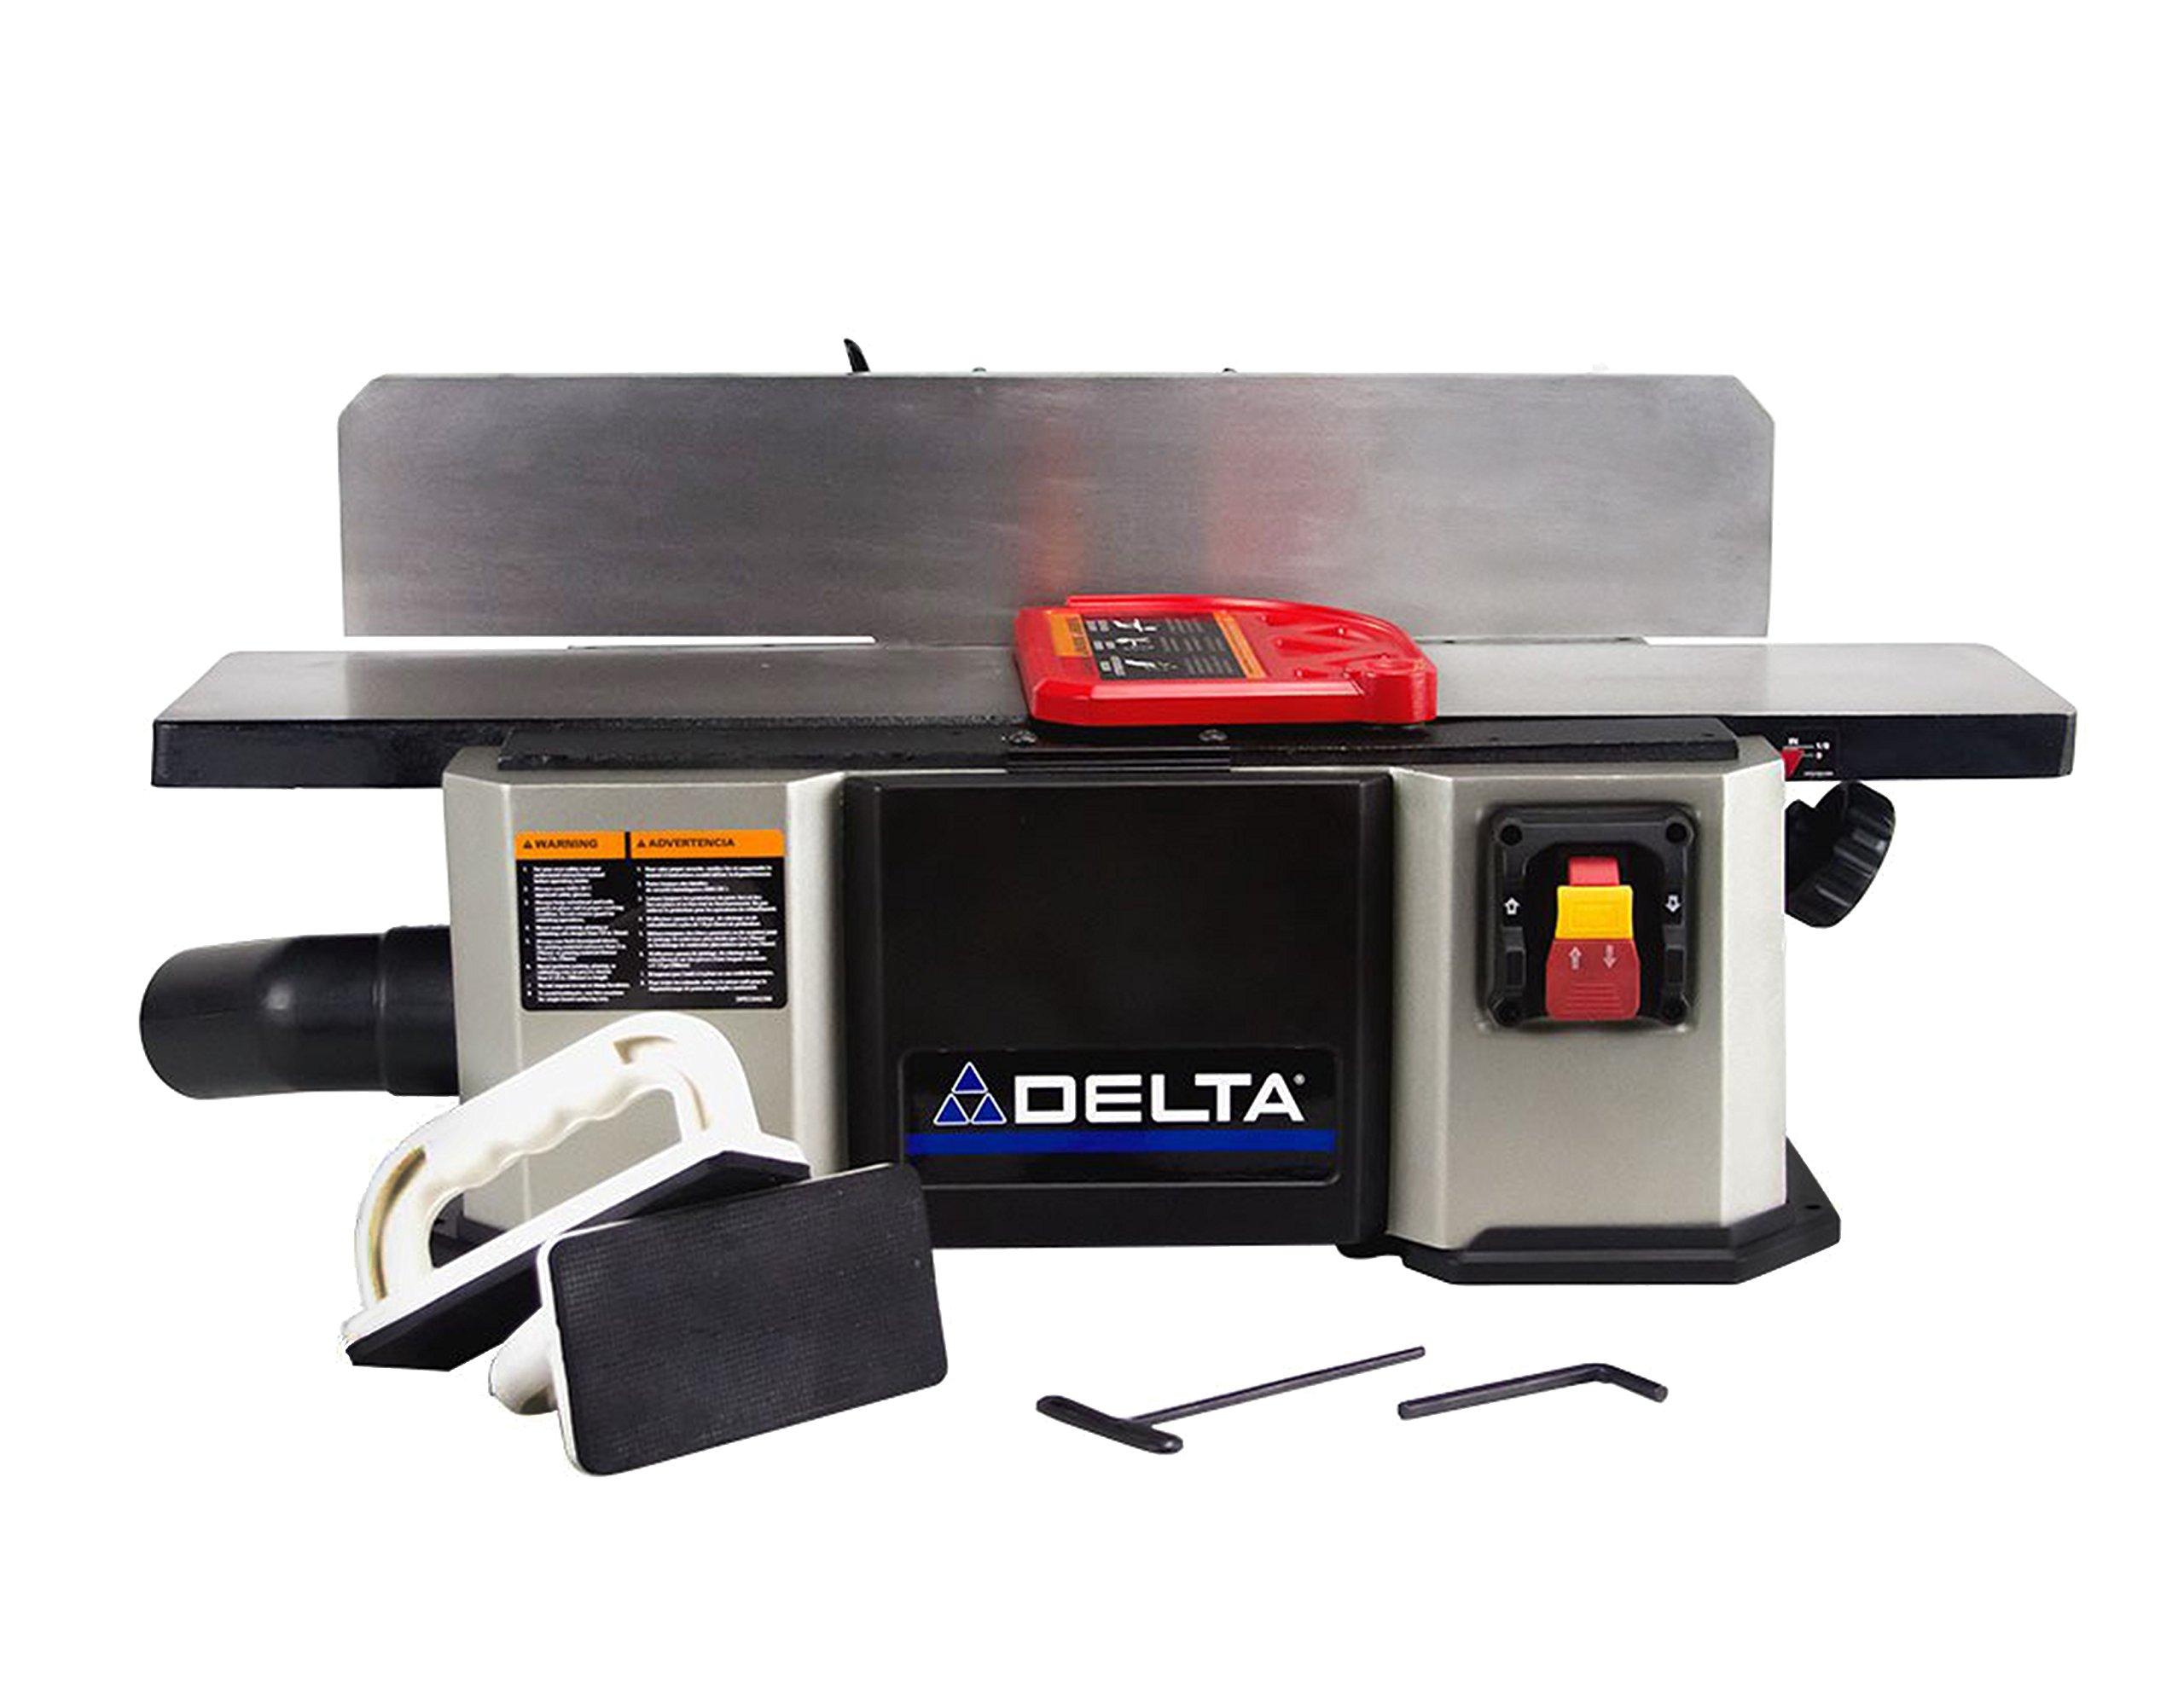 delta power tools 37 071 6 inch midi bench jointer ebay